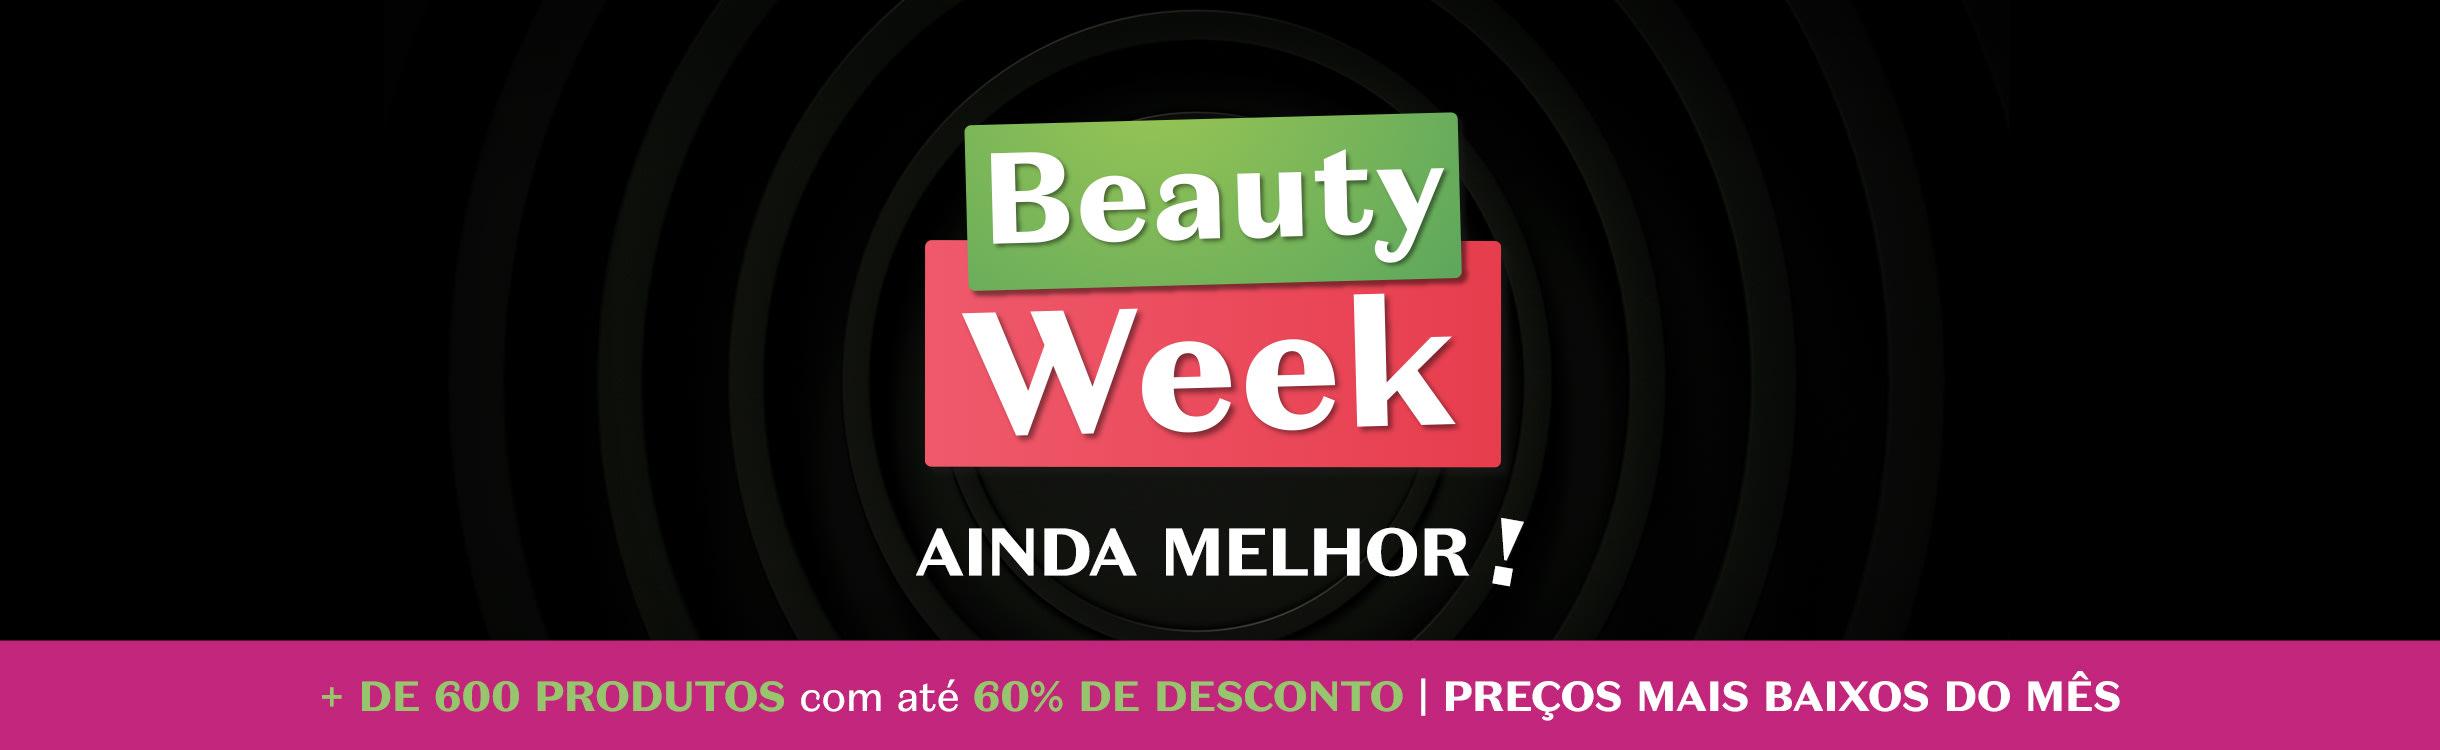 Beauty Week - Descontos de 40% até 60%